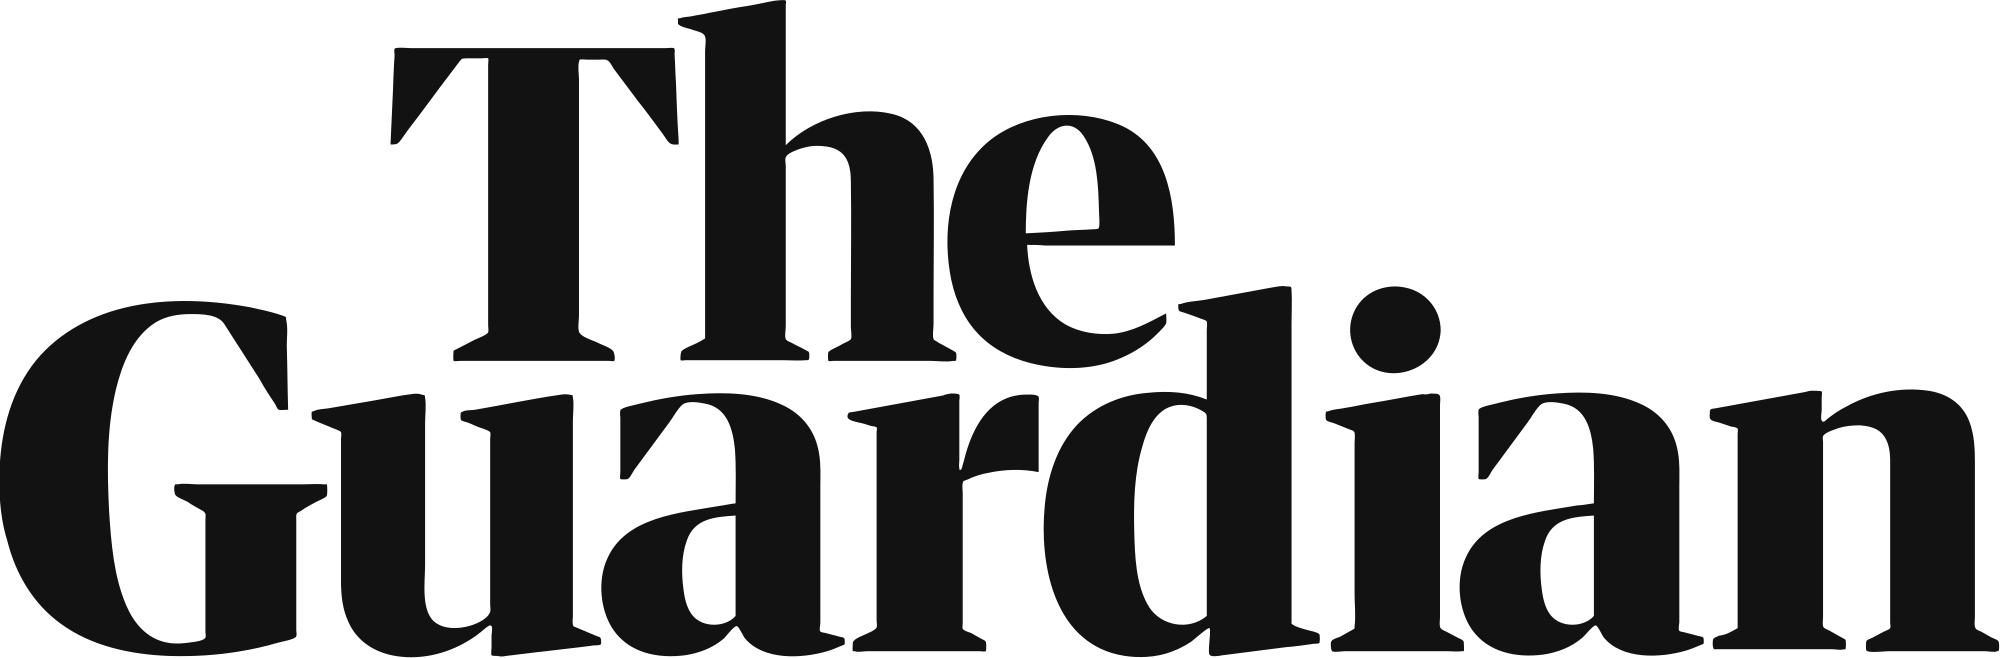 the guardian digital advertising activity